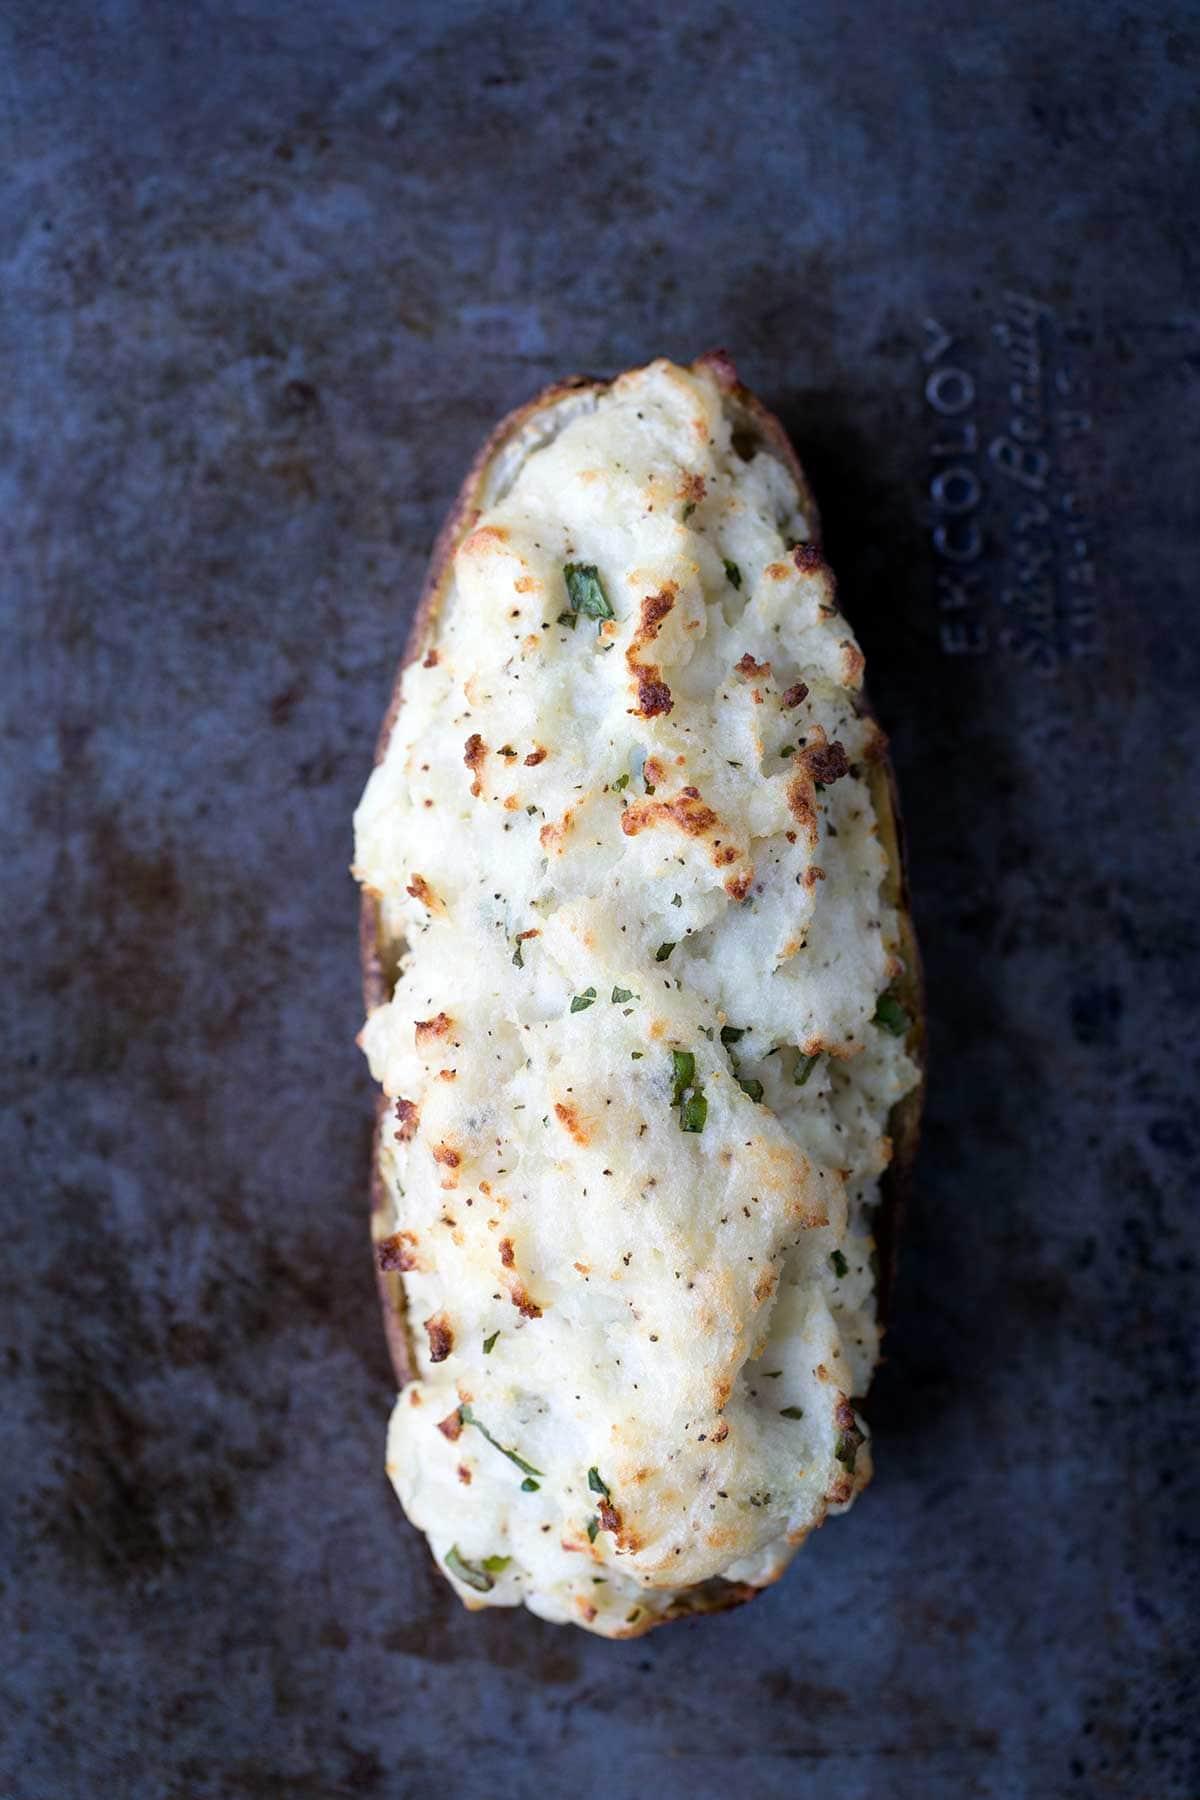 An overhead shot of a single twice-baked potato on a baking sheet.